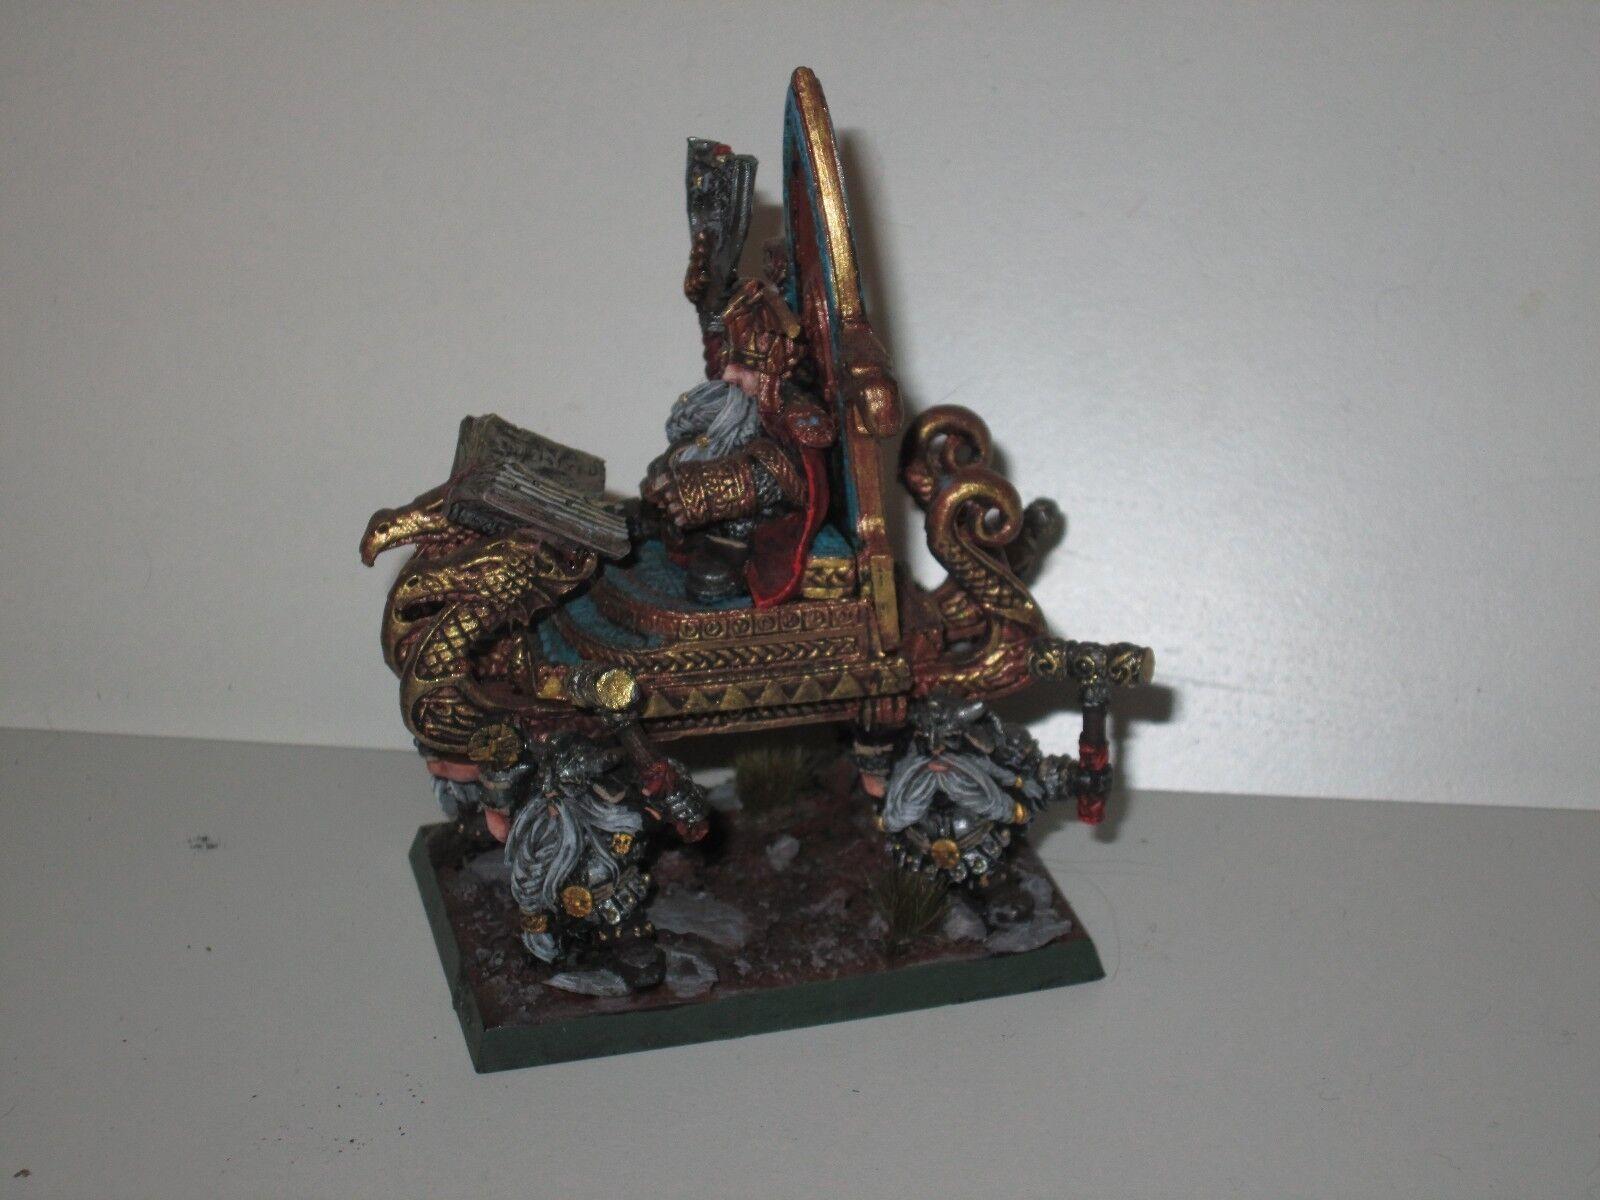 Warhammer Fantasy Dwarf Lord throgrim grudgebearer Finecast Résine Épuisé 2455   juste l'acheter